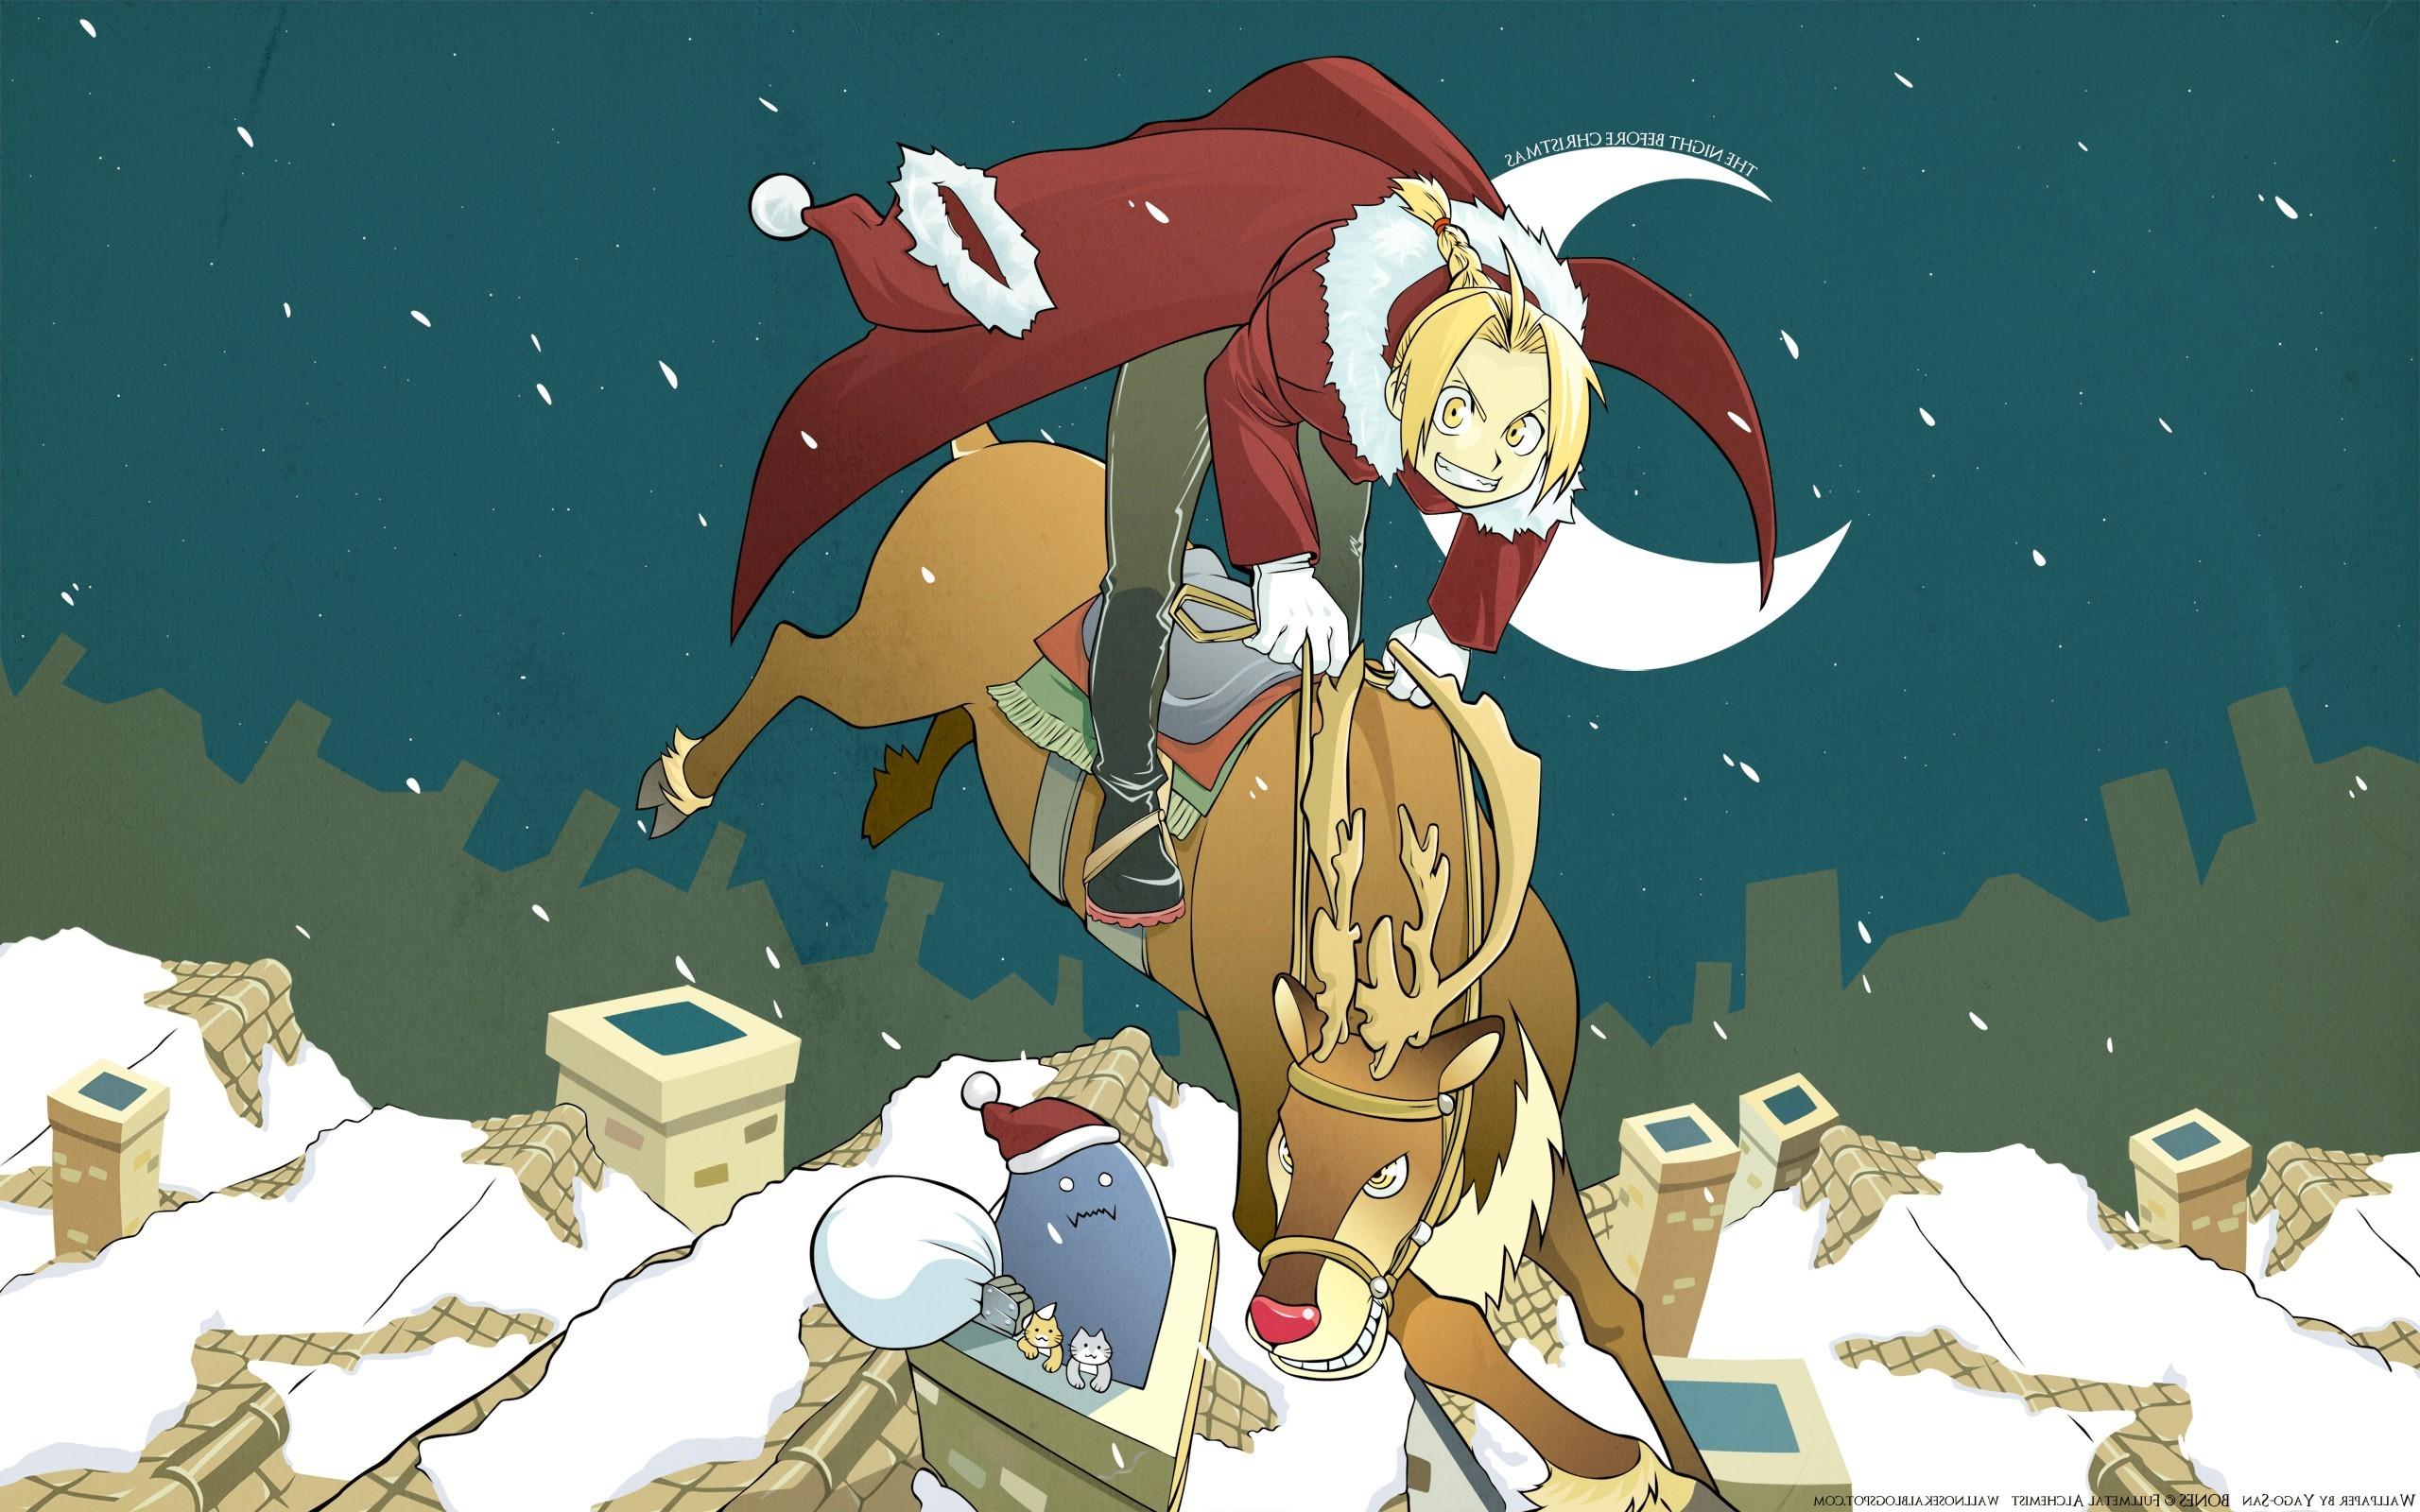 navidad anime wallpaper,animated cartoon,cartoon,illustration,art,animation